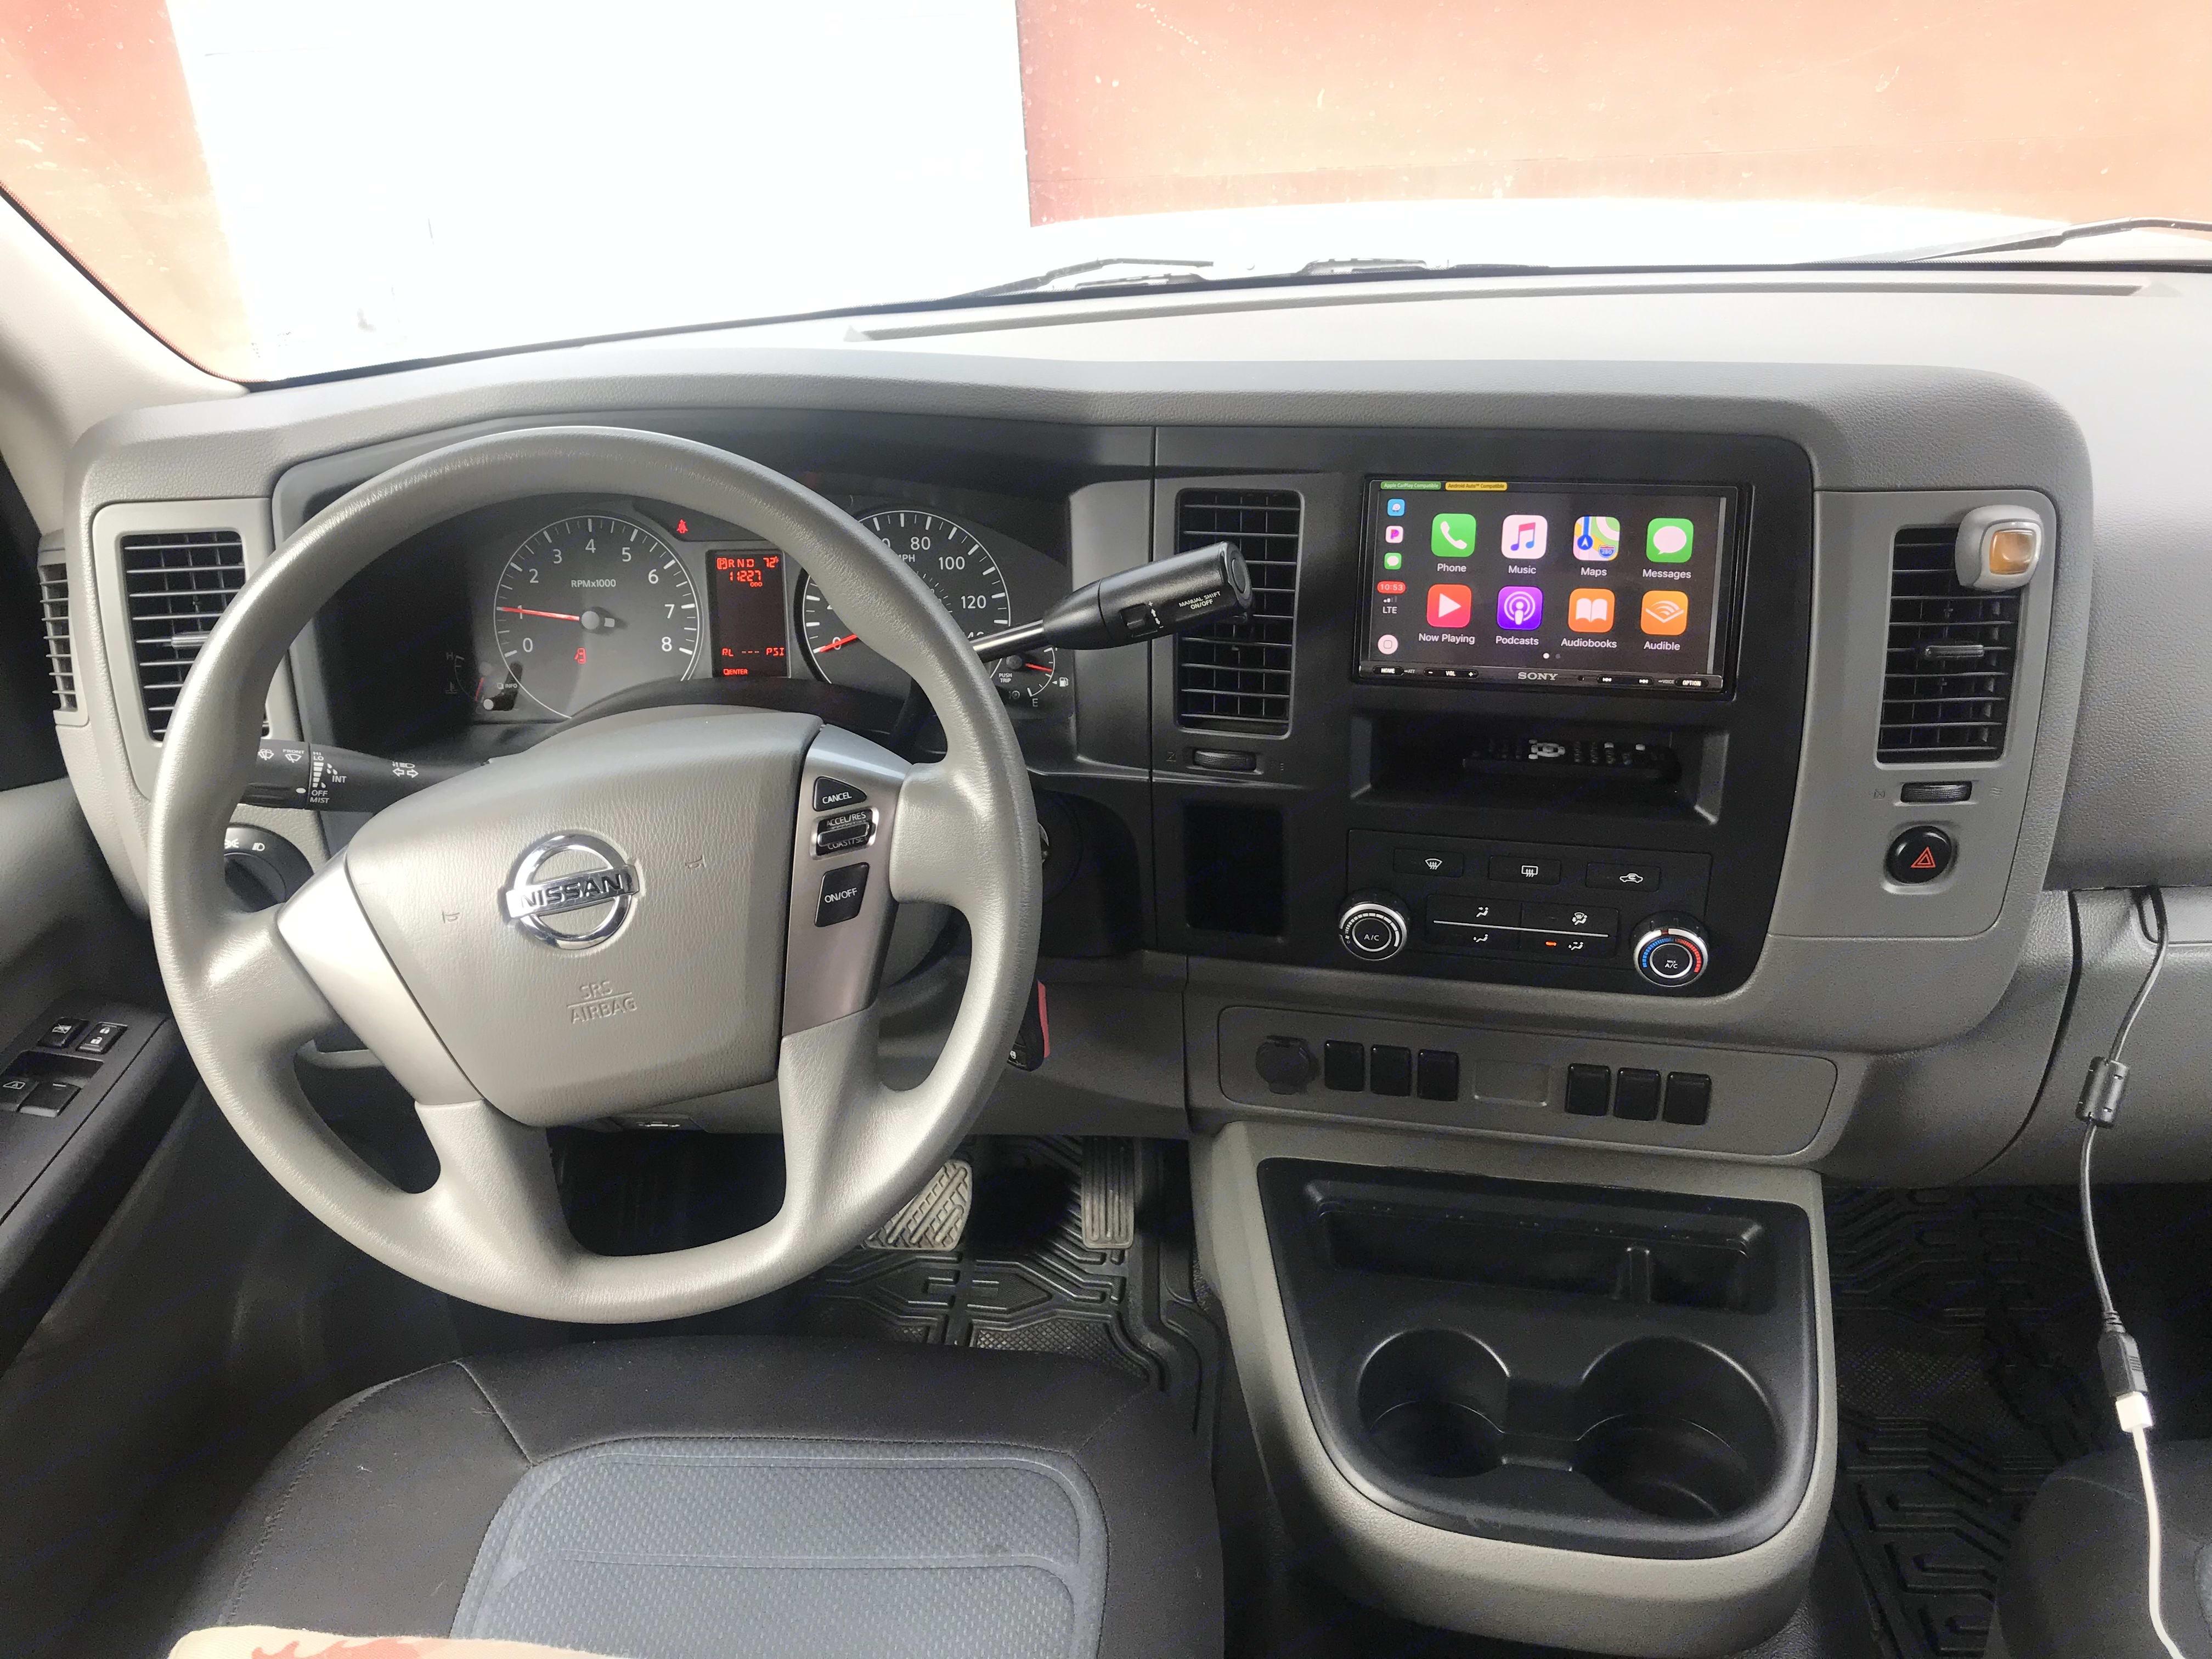 Nissan NV 1500 2015